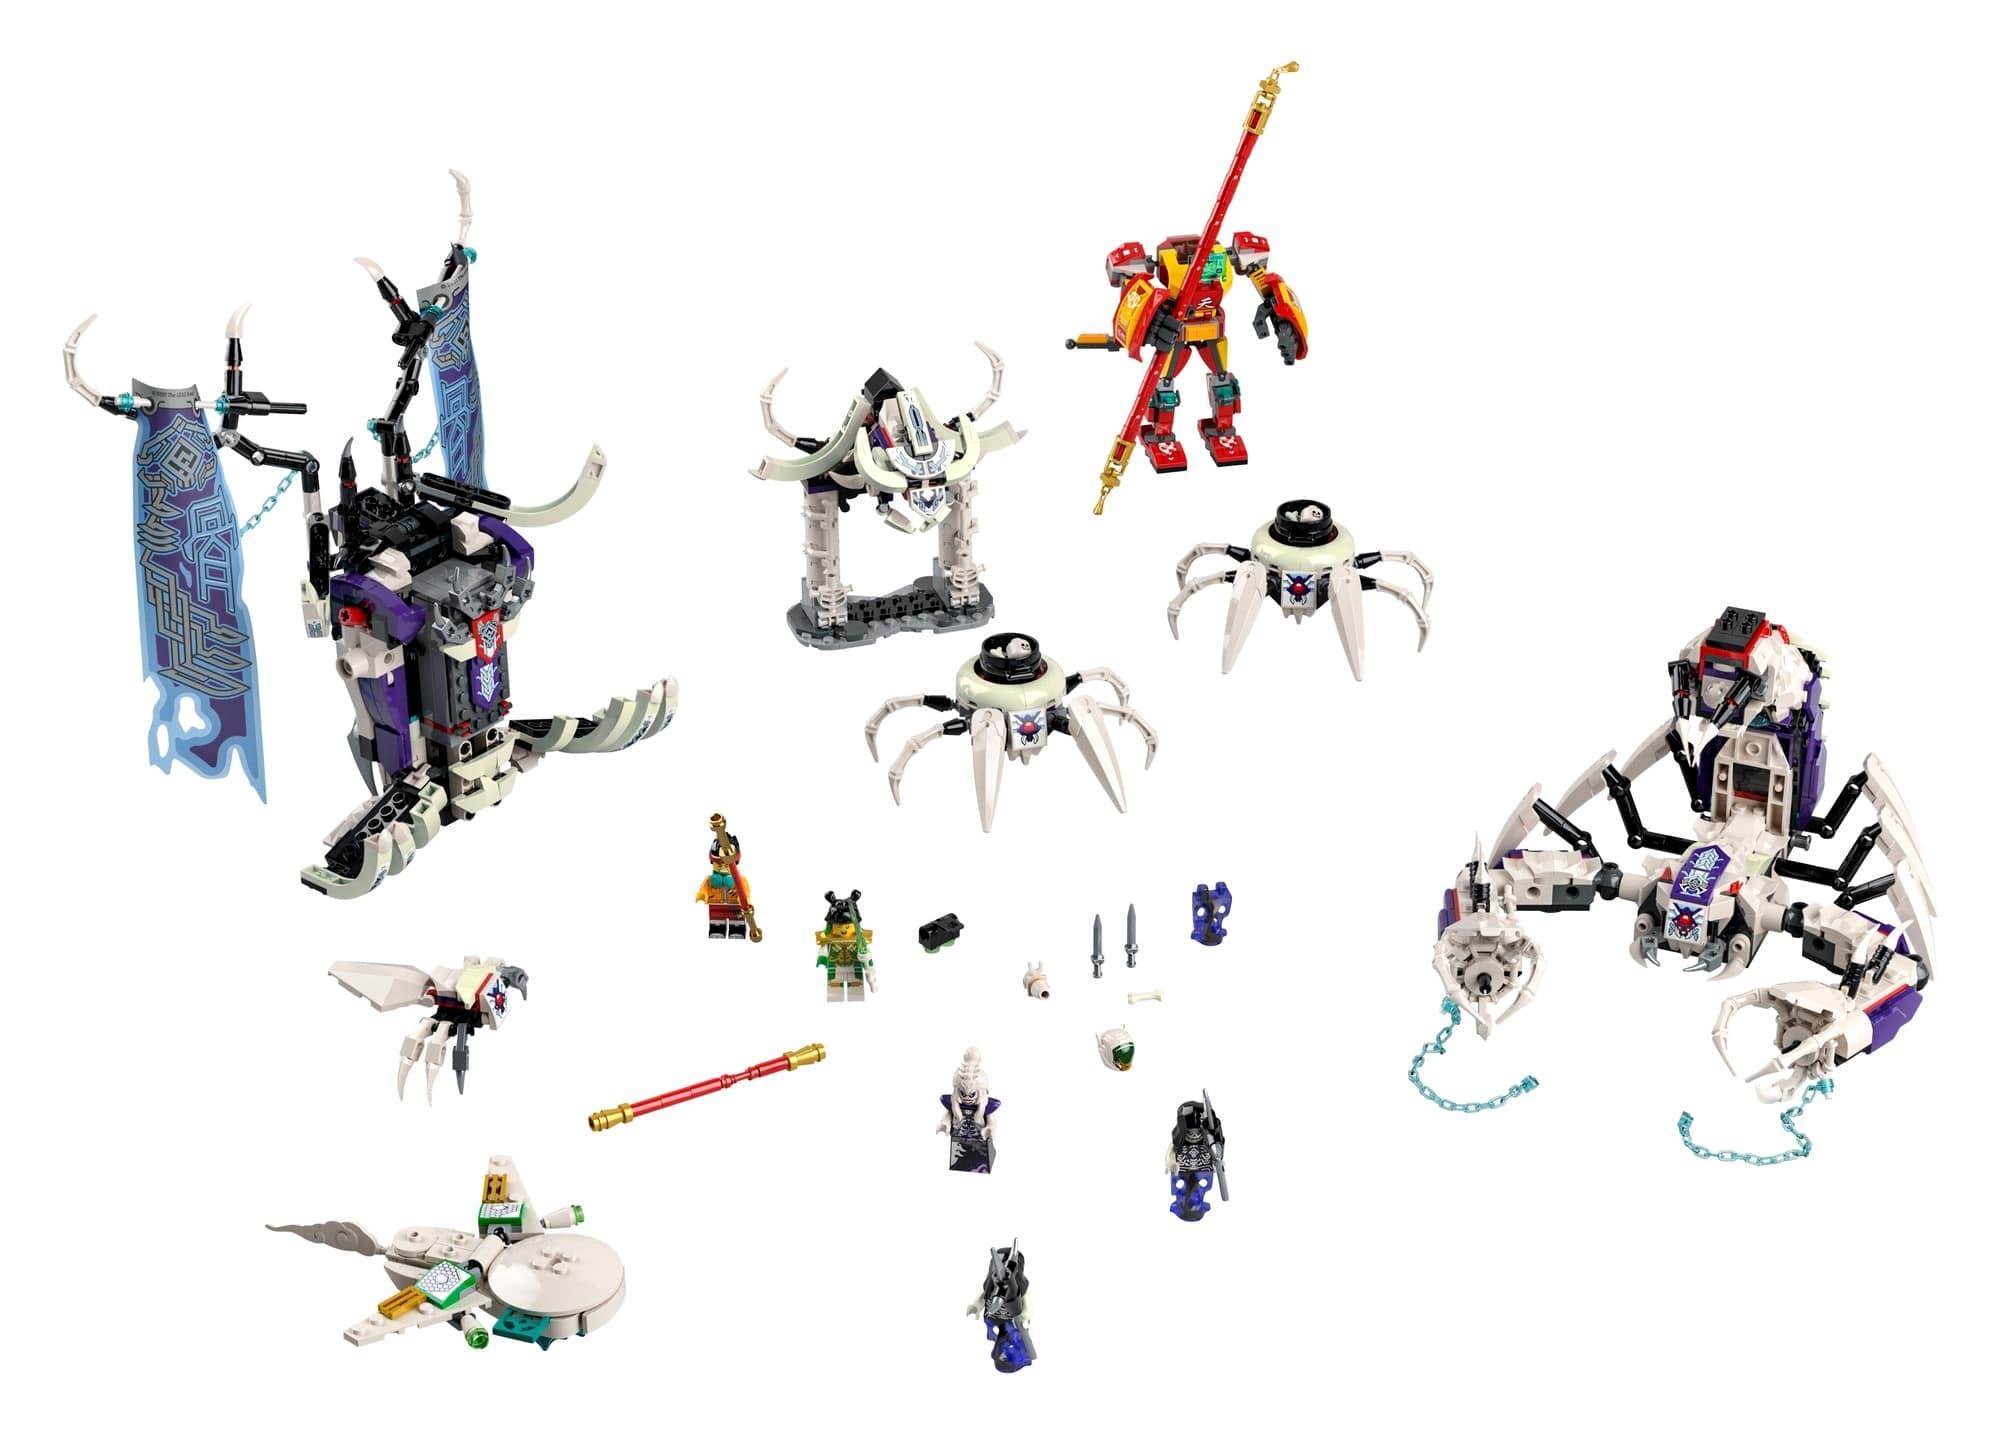 LEGO Monkie Kid 80028 Bone Demon 1